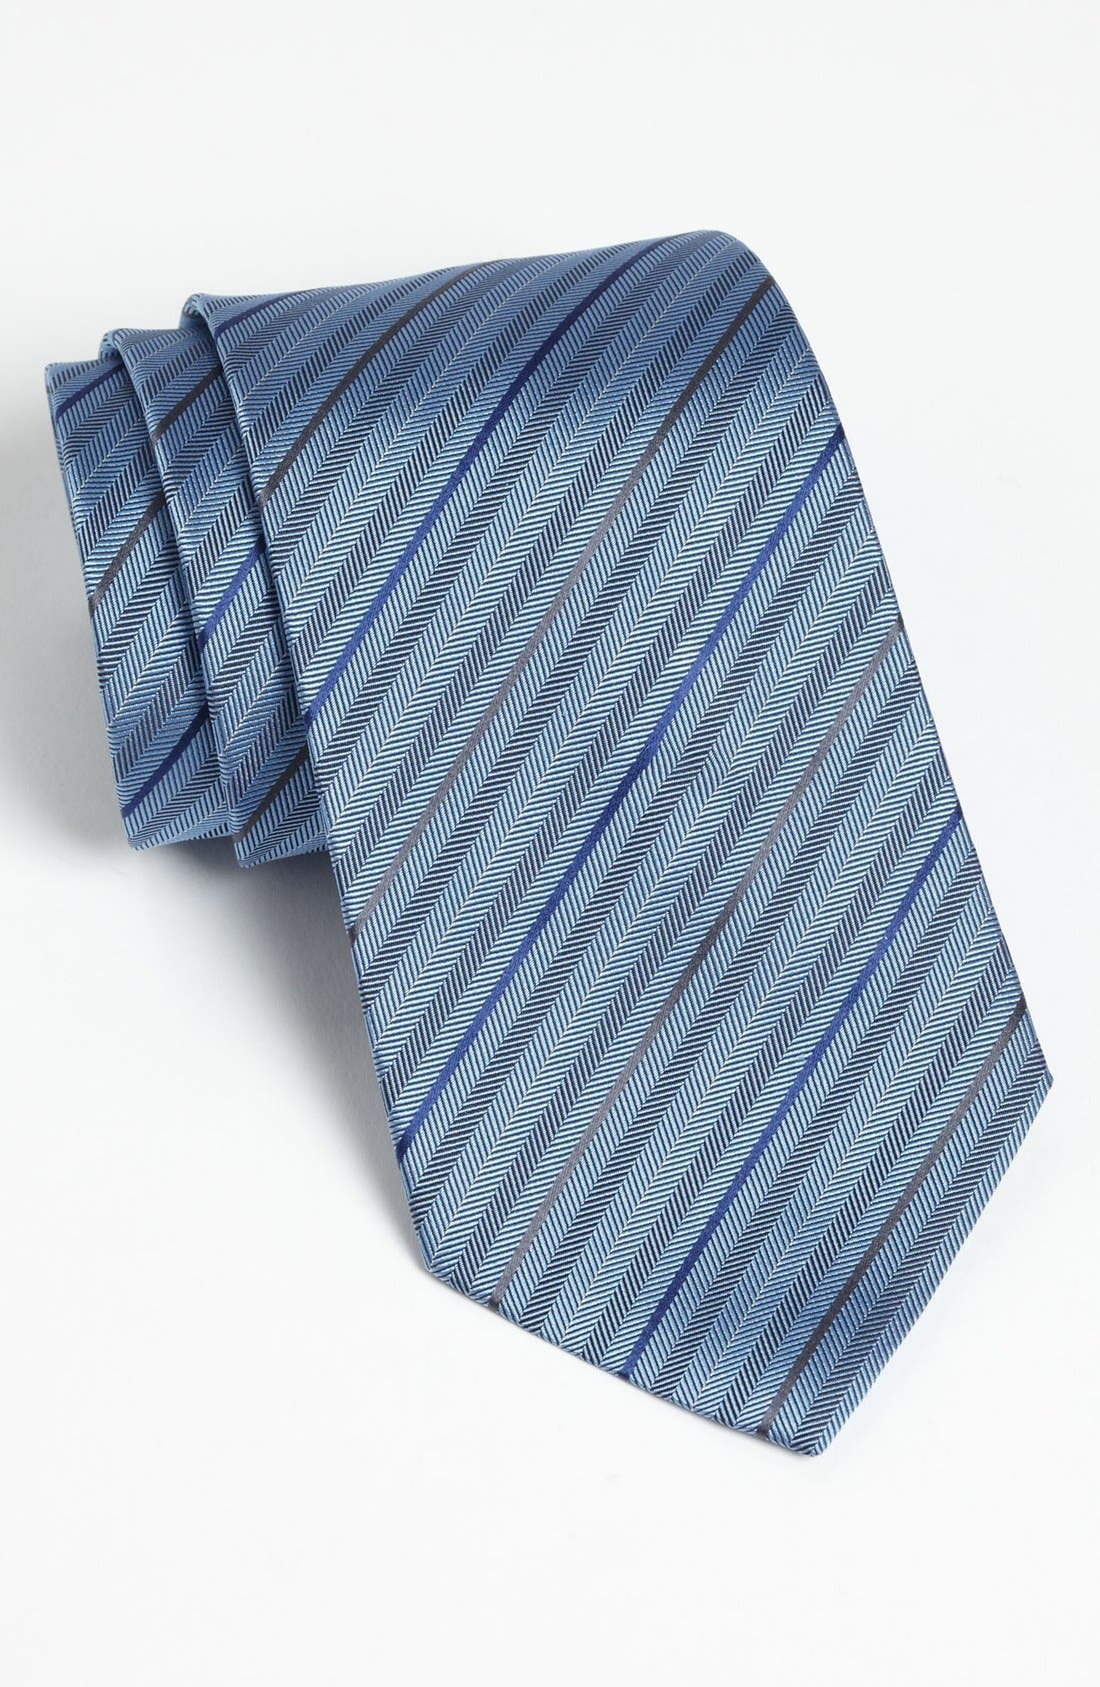 Main Image - Z Zegna Herringbone Stripe Woven Silk Tie